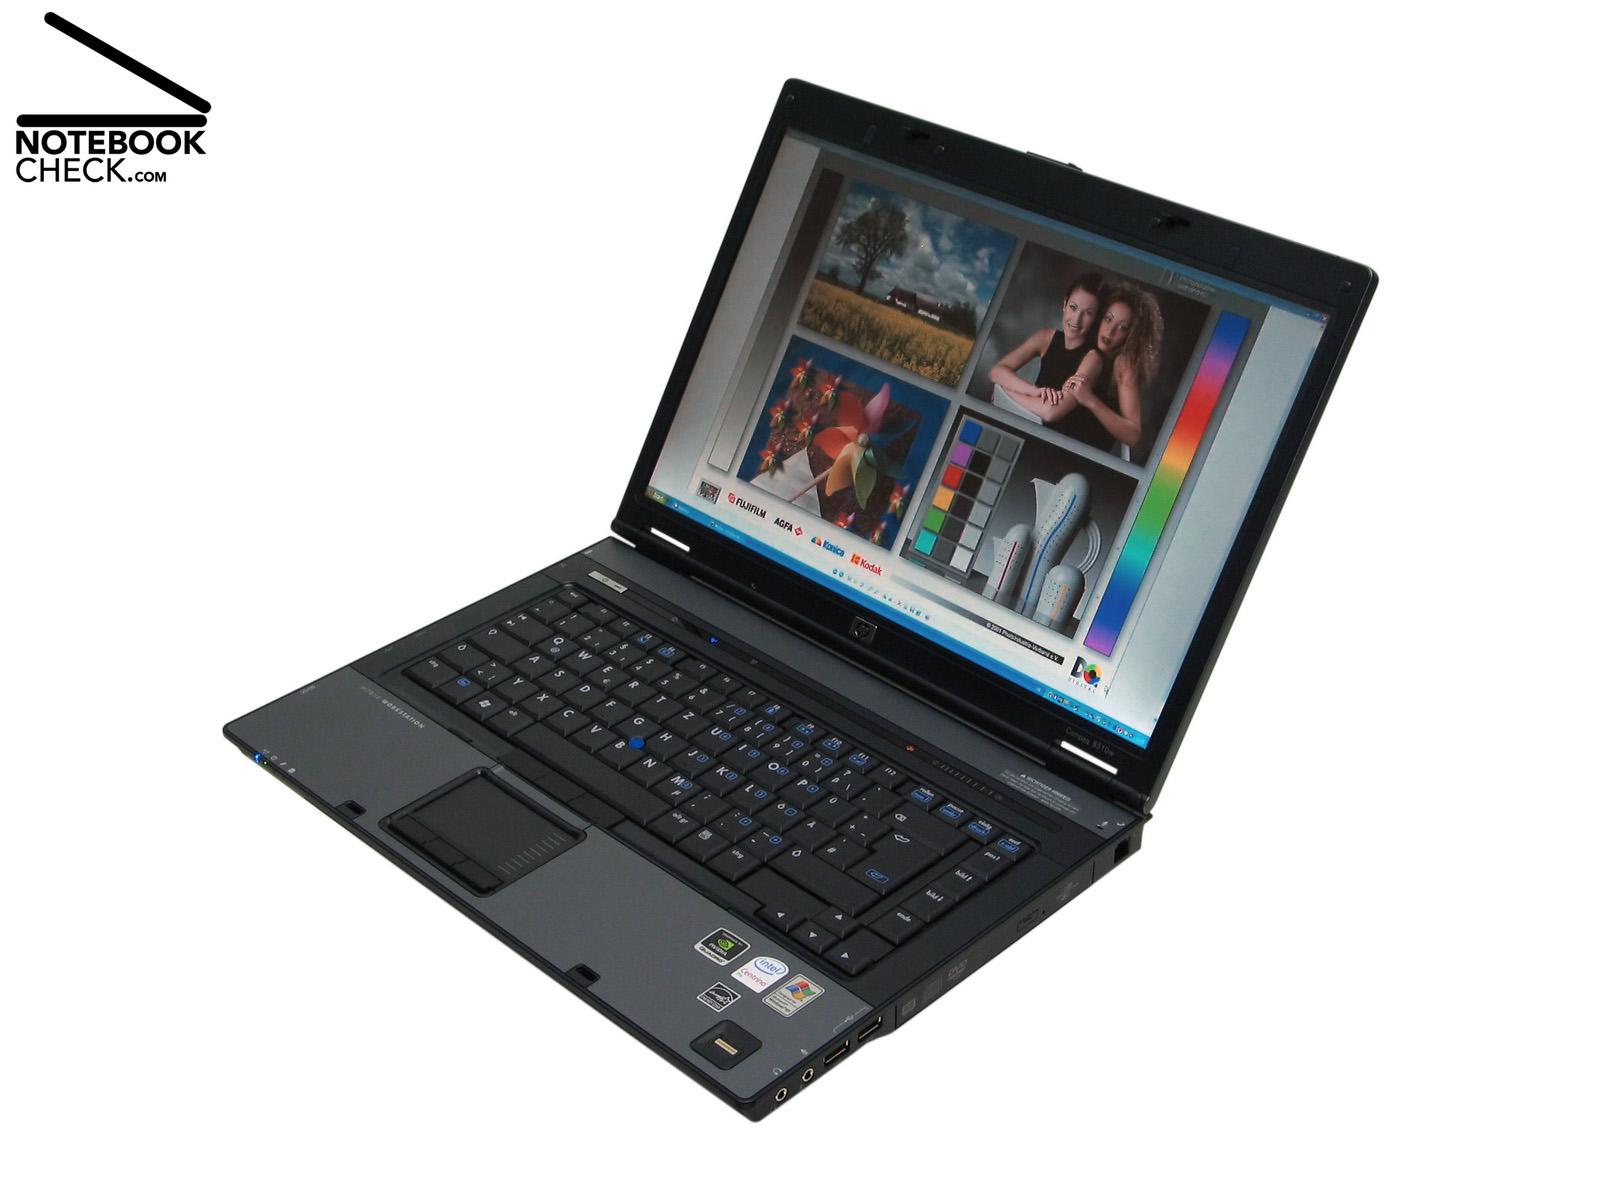 HP Compaq 8510w Mobile Workstation Intel 82566MM LAN Treiber Windows 7